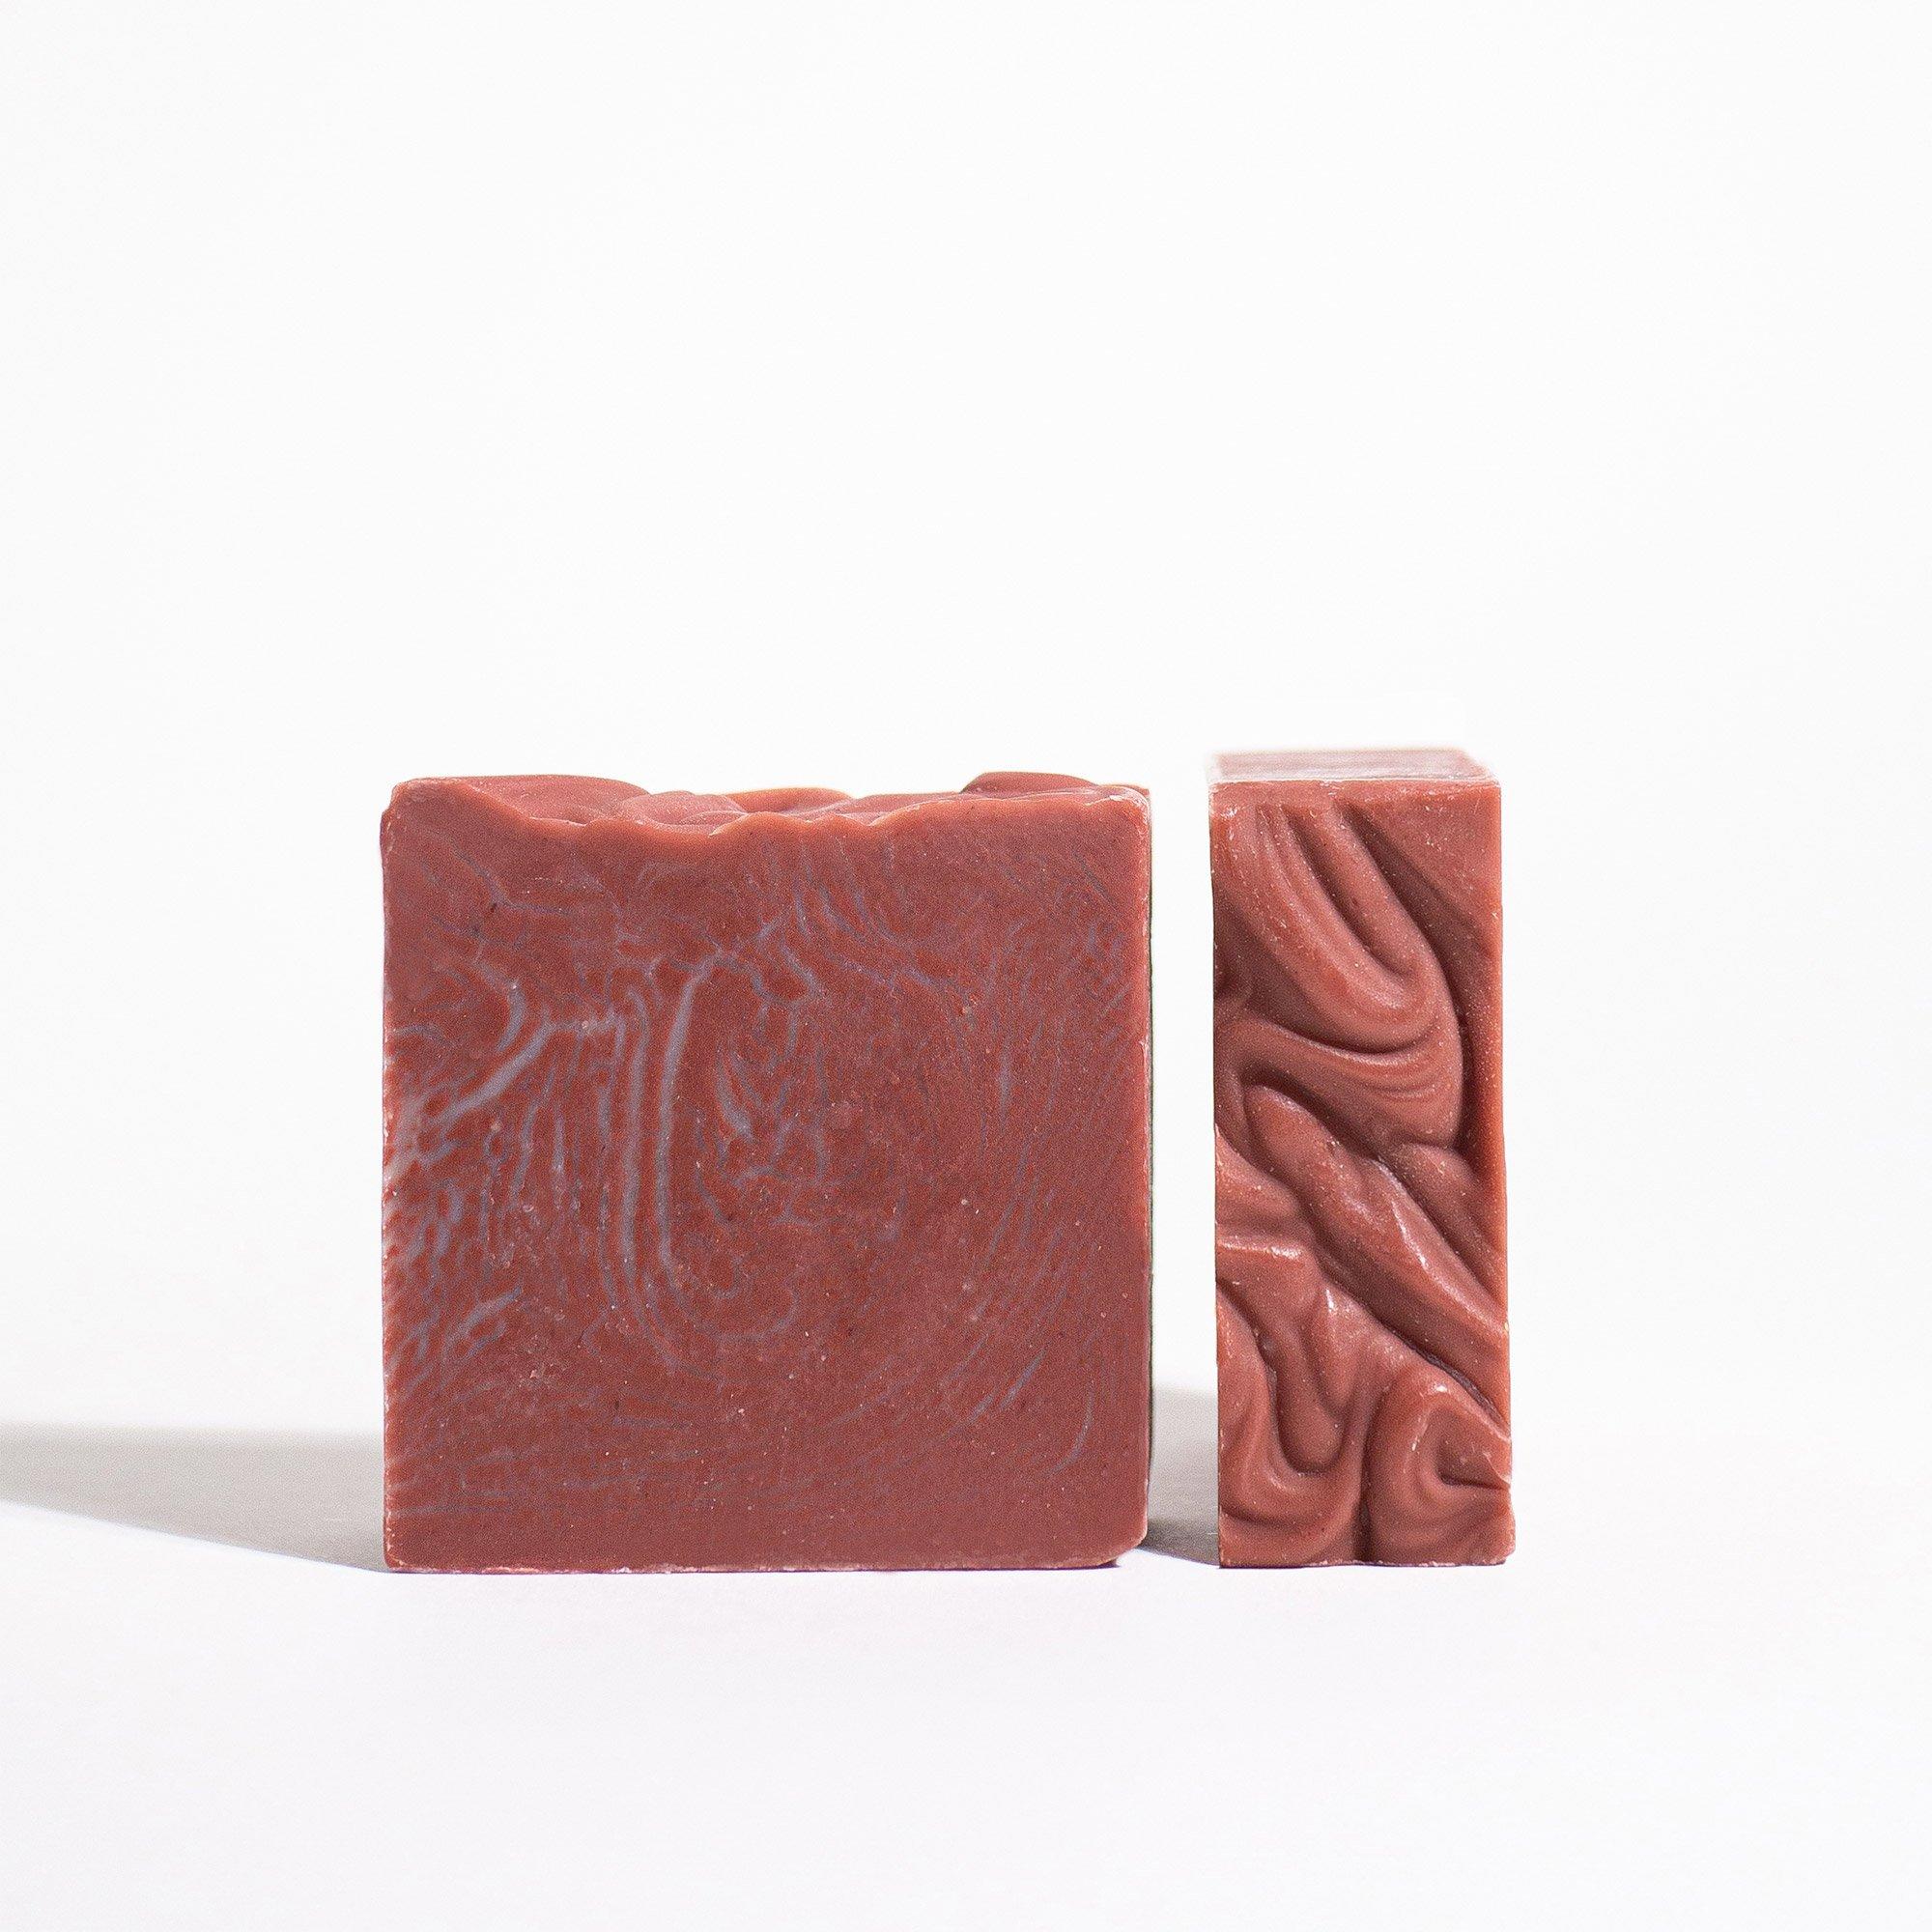 Grace and Green - YOKU soap - Lavender & Patchouli 3